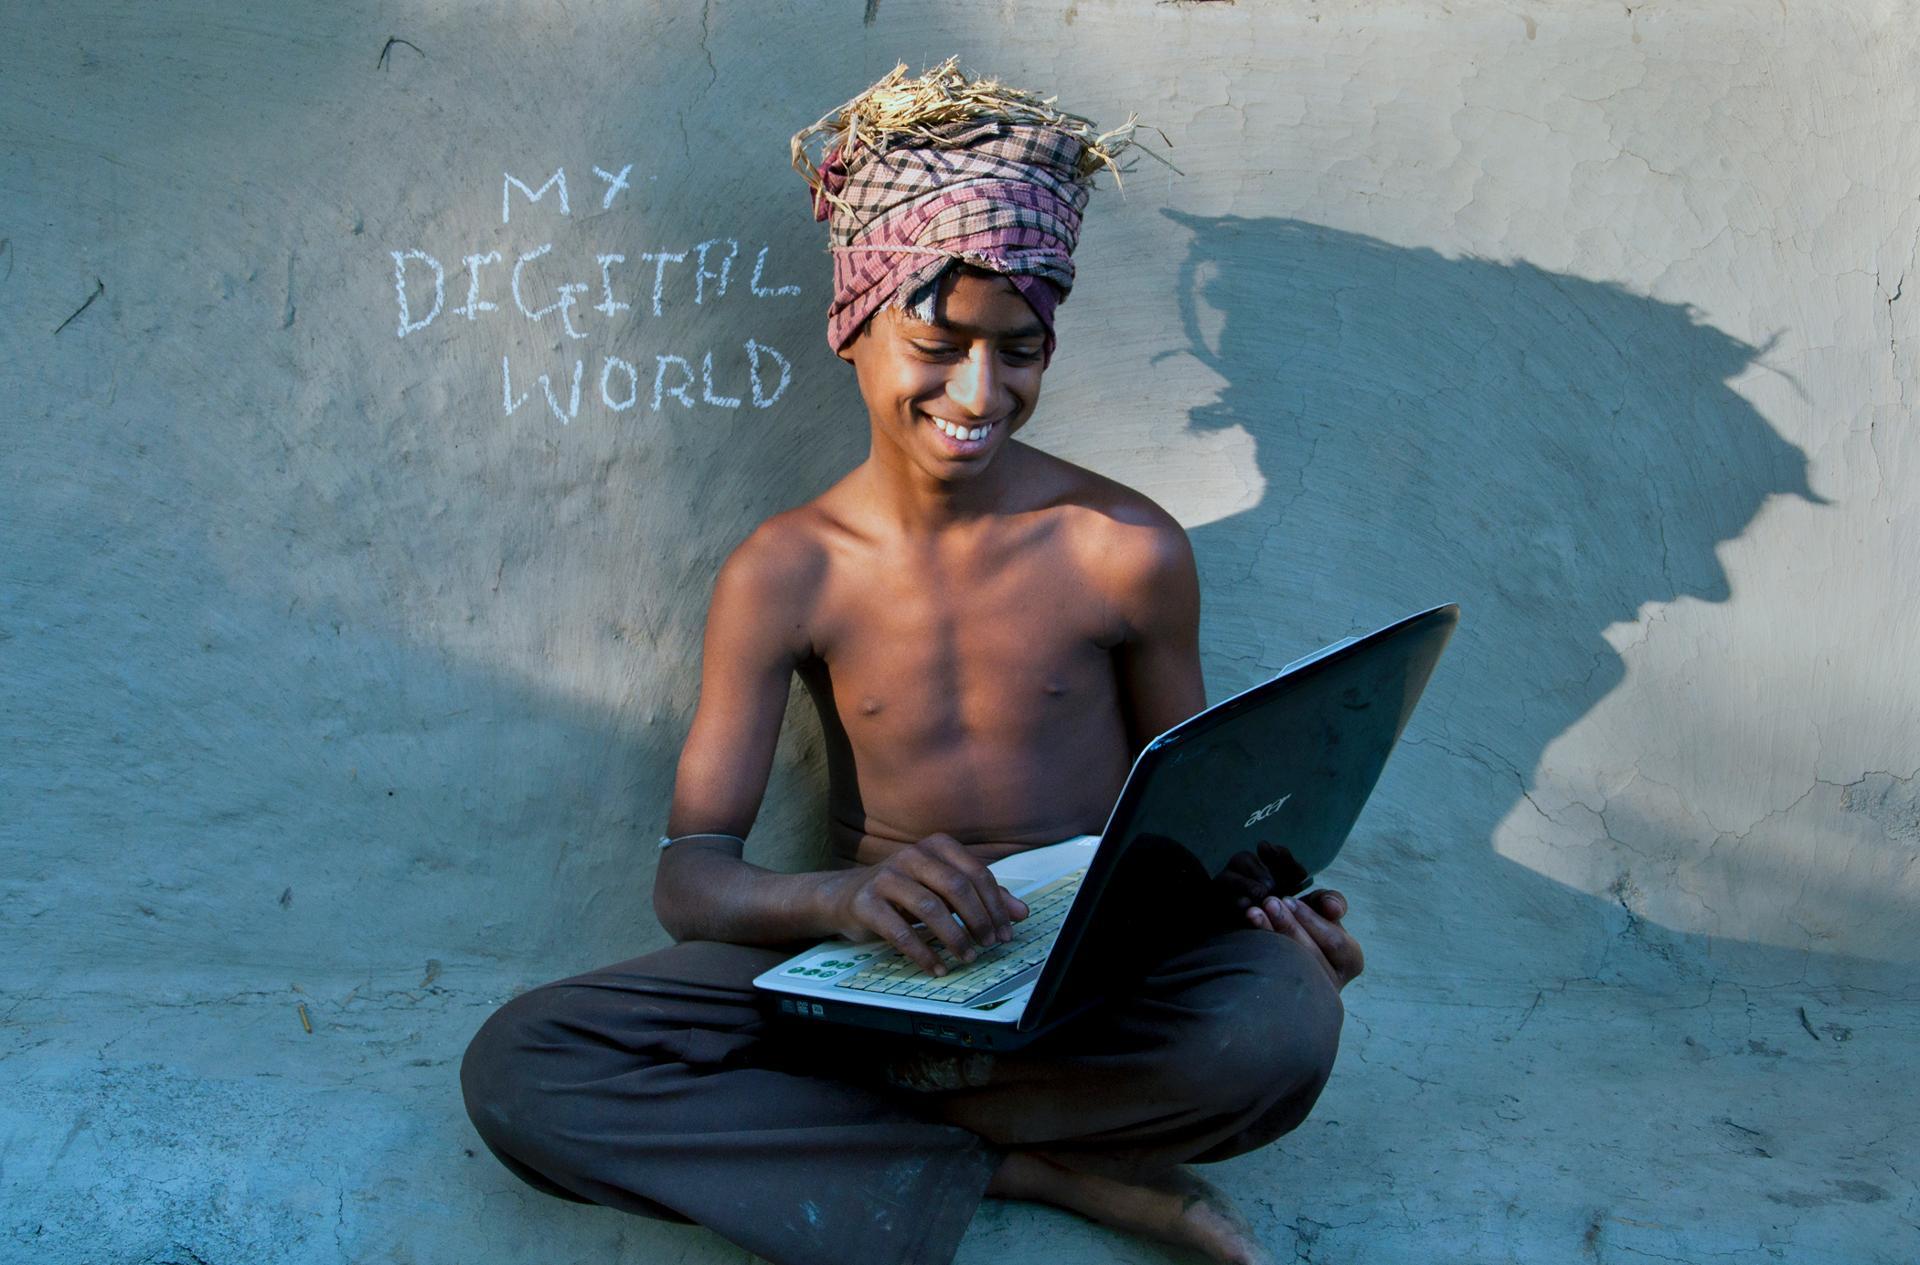 My Digital World..jpg